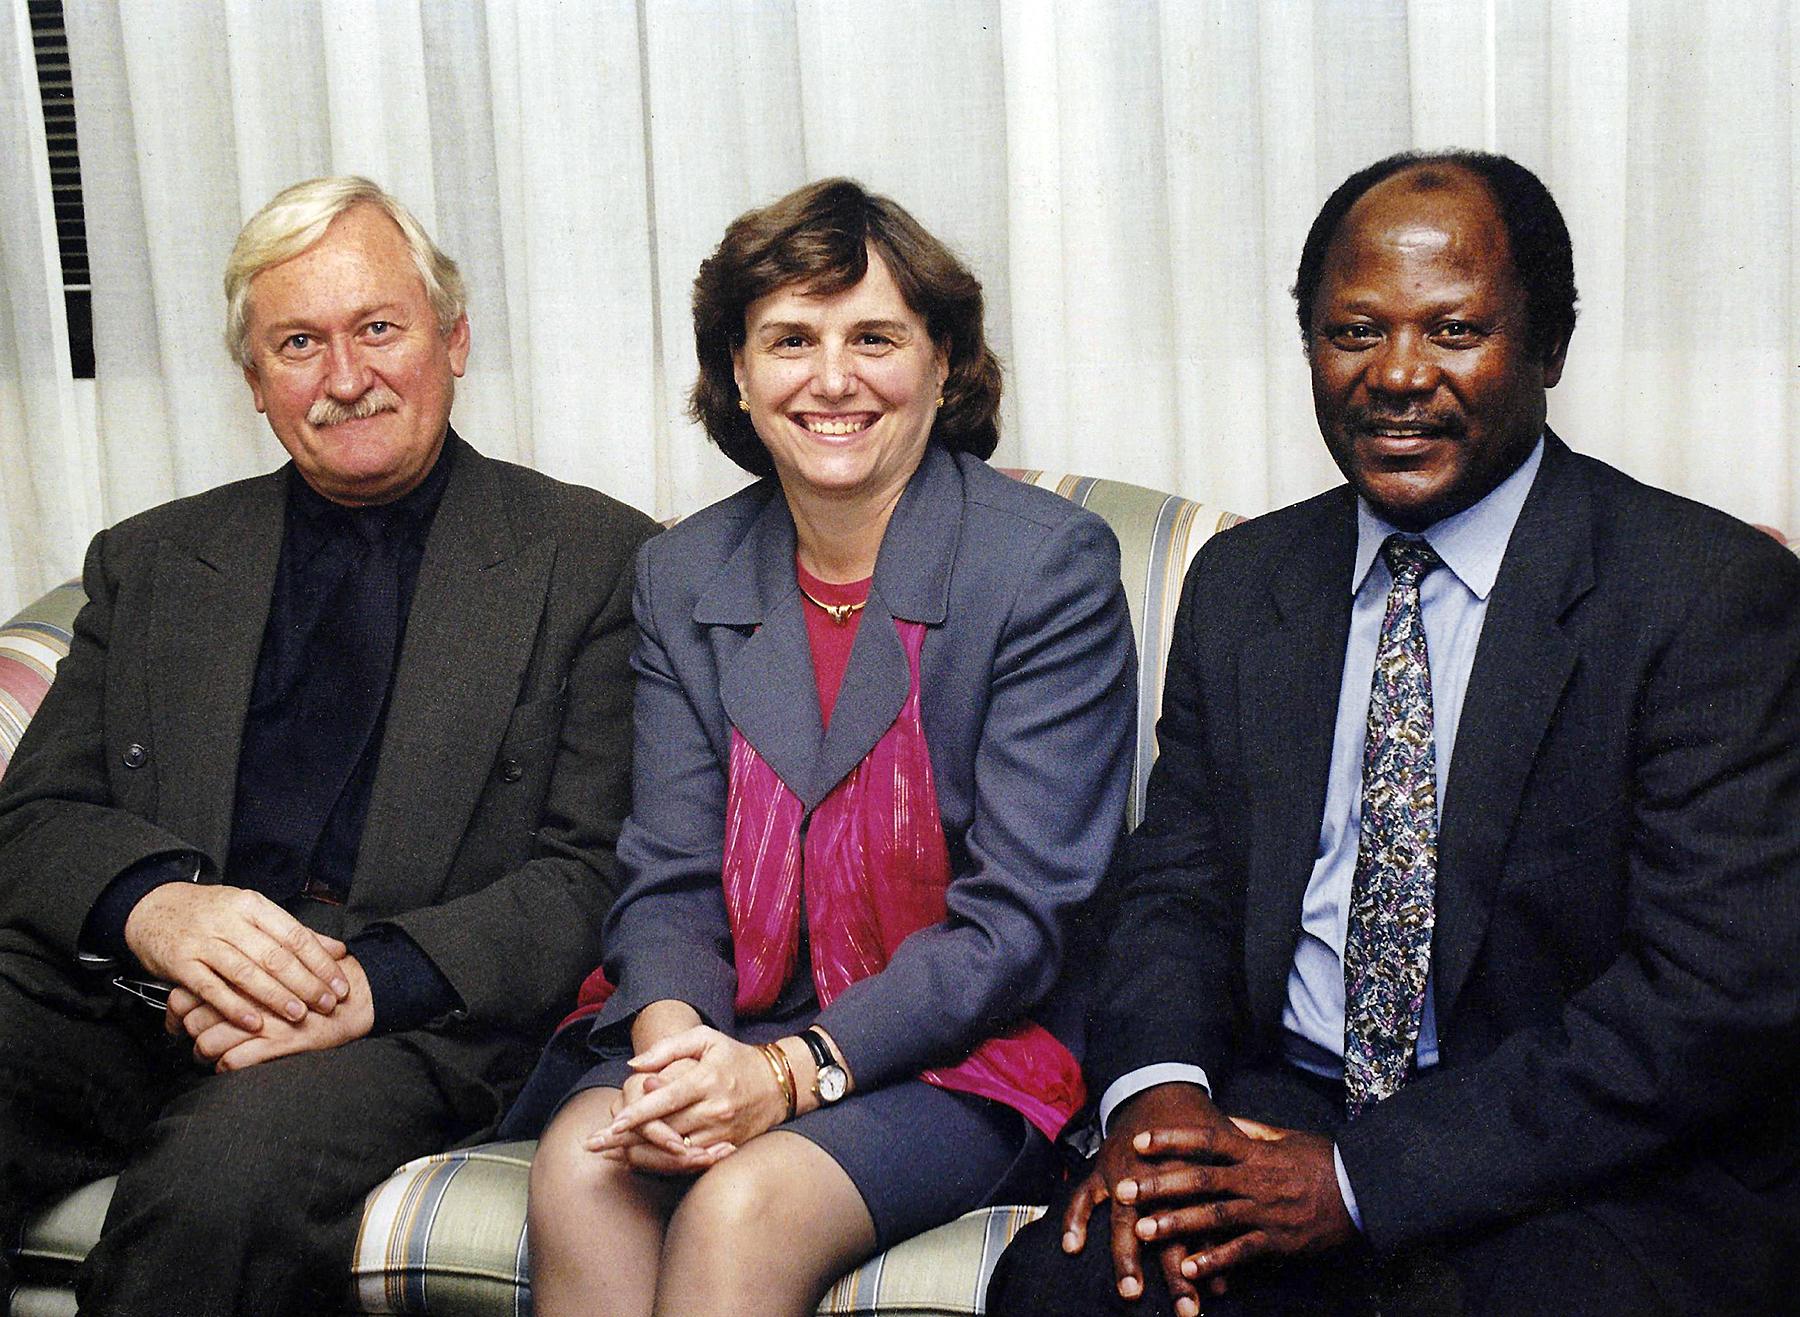 WFP senior leadership dream team Assisatant Executive Director Jean-Jacques Graisse, Executive Director Catherine Bertini, and Deputy Executive Director Namanga Ngongi (1999)